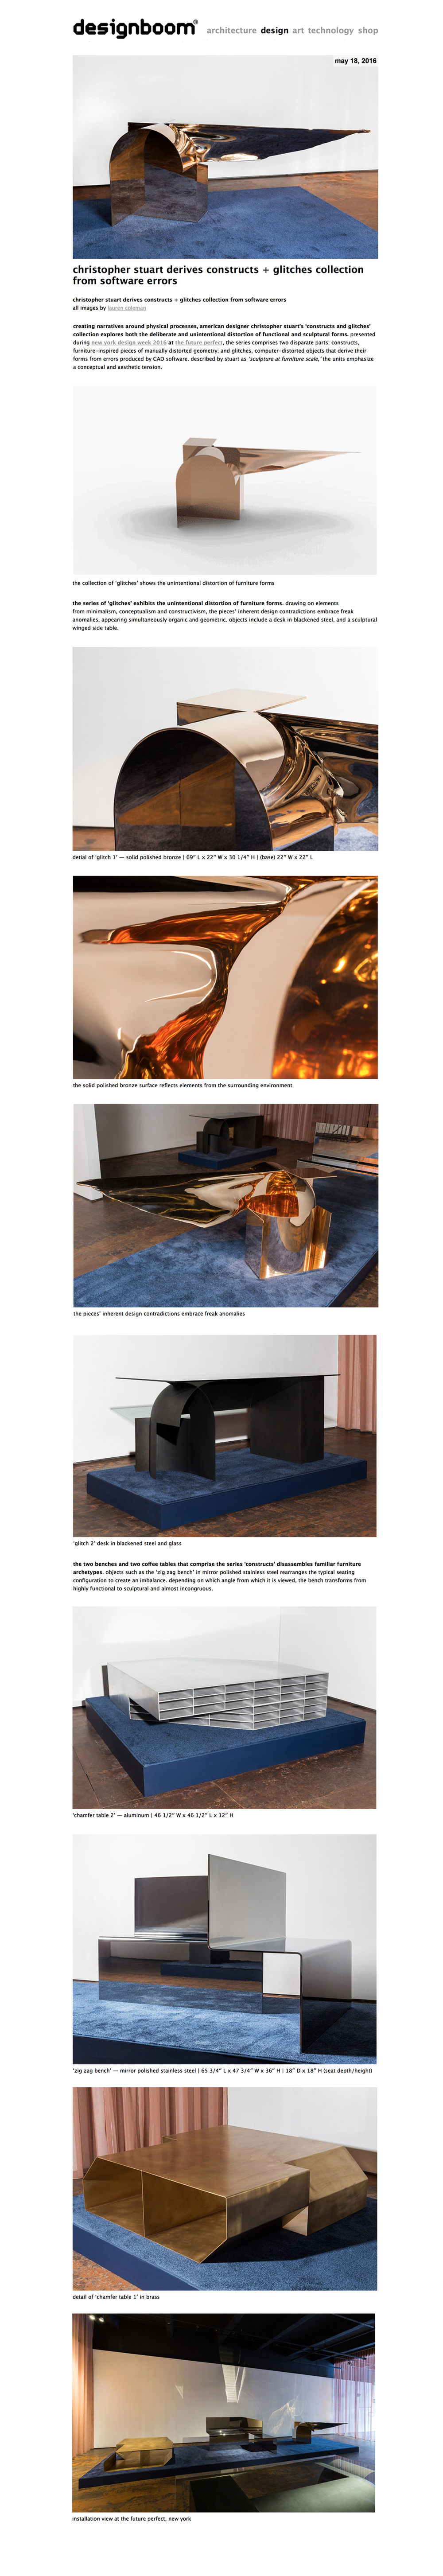 christopher stuart-designboom-press1